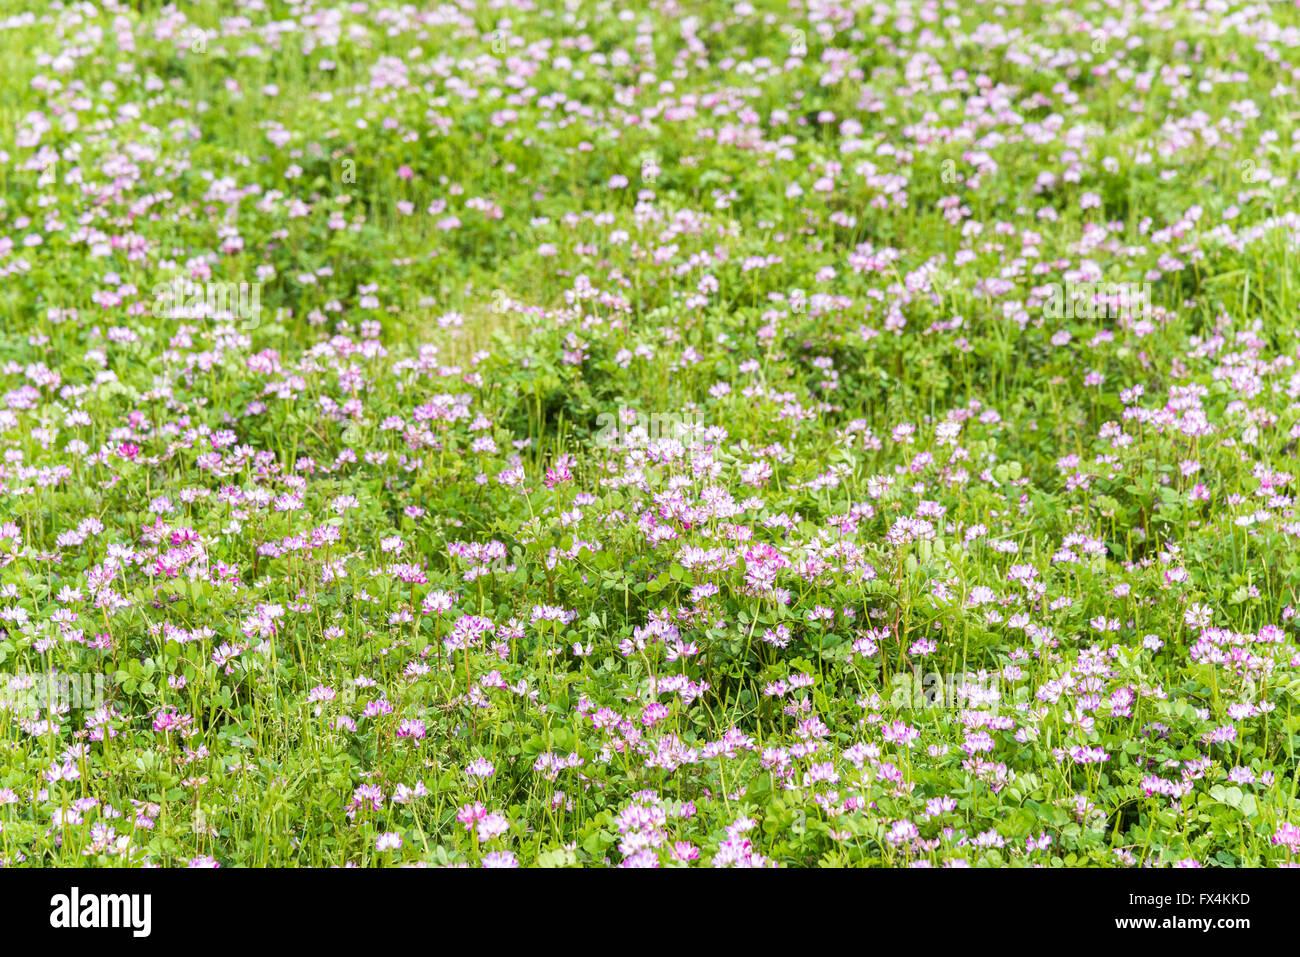 Isehara City, Japan. 10th April, 2016. Chinese Milk Vetch flowers (Astragalus sinicus or Renge or Genge) flowers - Stock Image